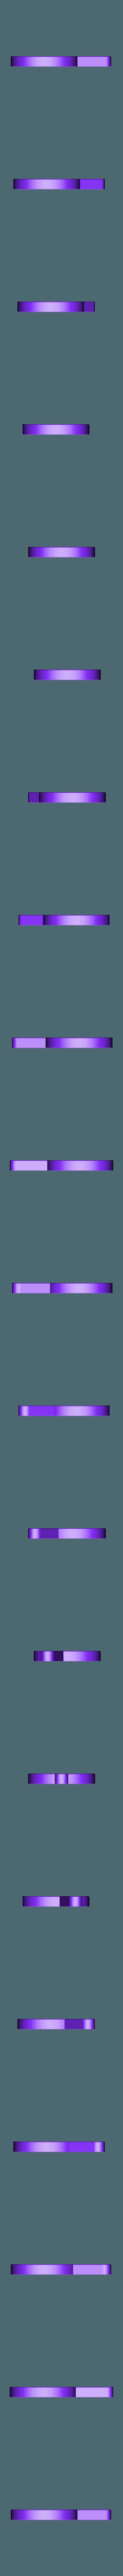 Soliflore-Pièce2-V2.stl Download STL file Stem vase / Vase to be fixed on a glass pot • 3D print object, Jonathan-AtelierVOUS